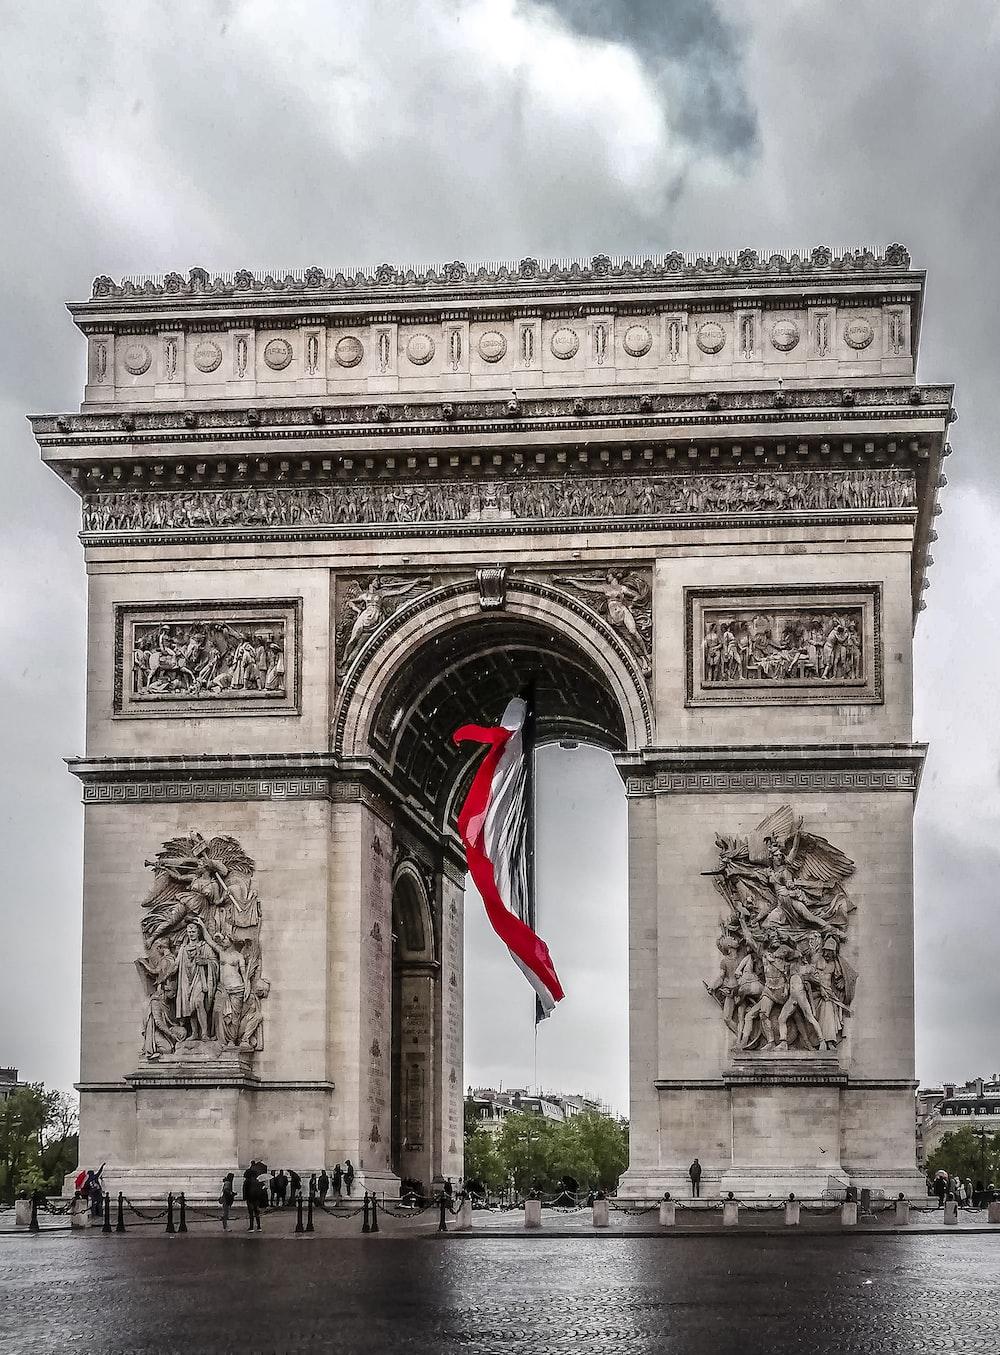 Arch de Triuphe France during daytime